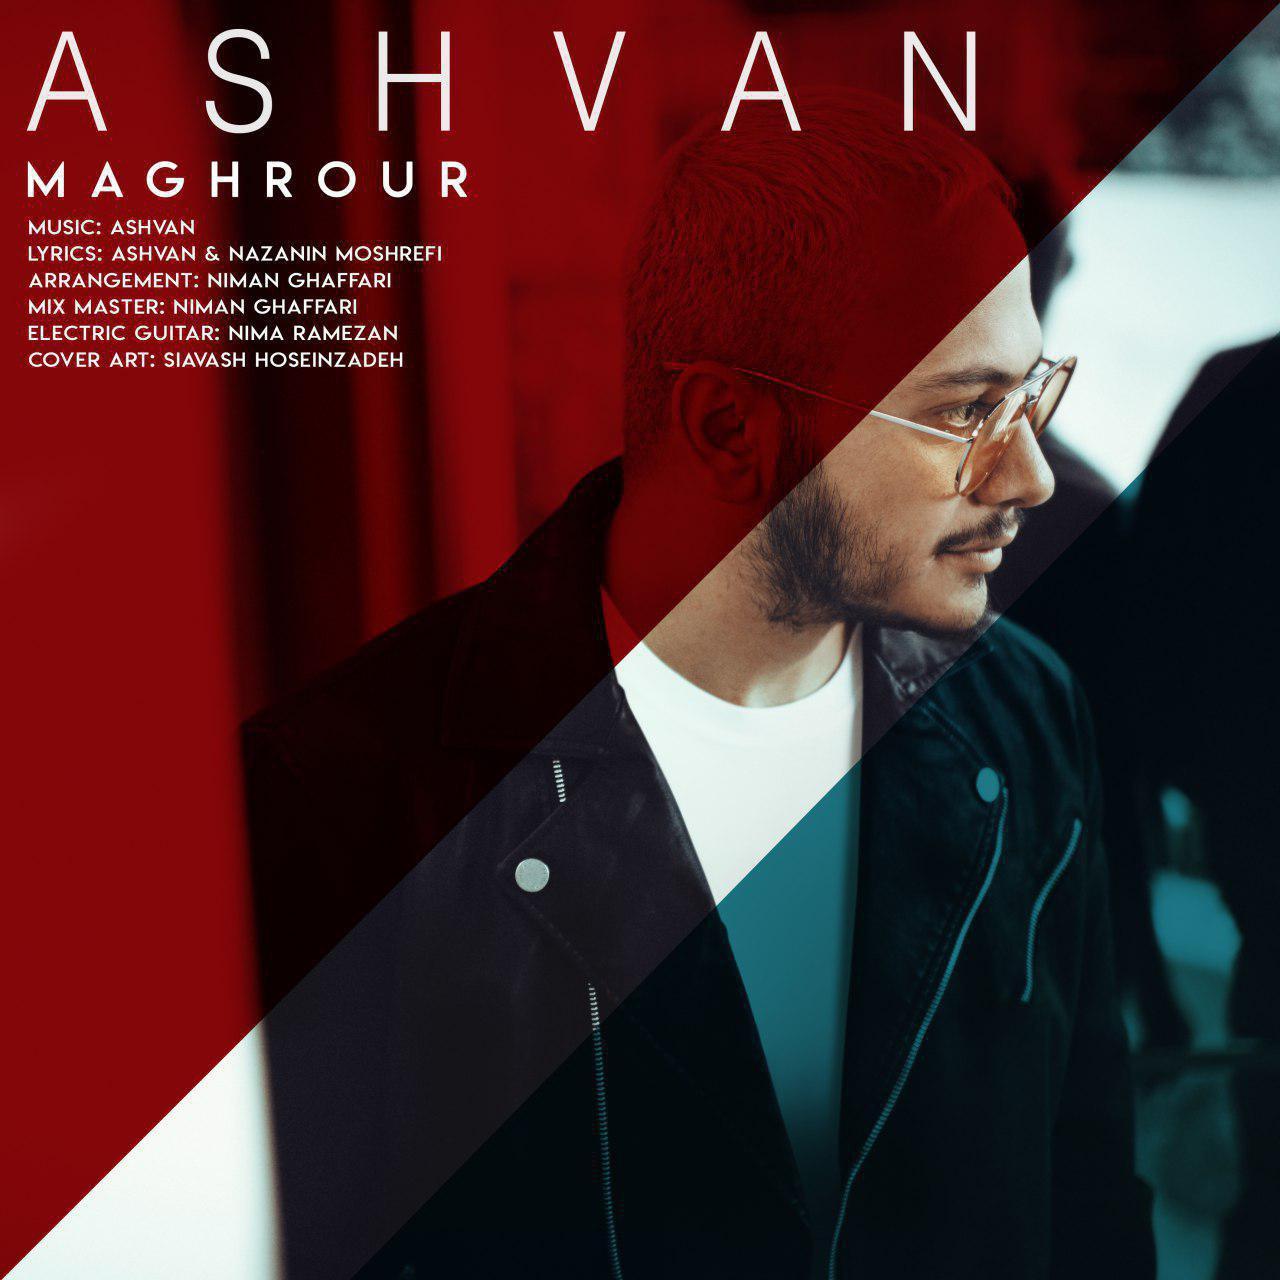 Ashvan – Maghrour